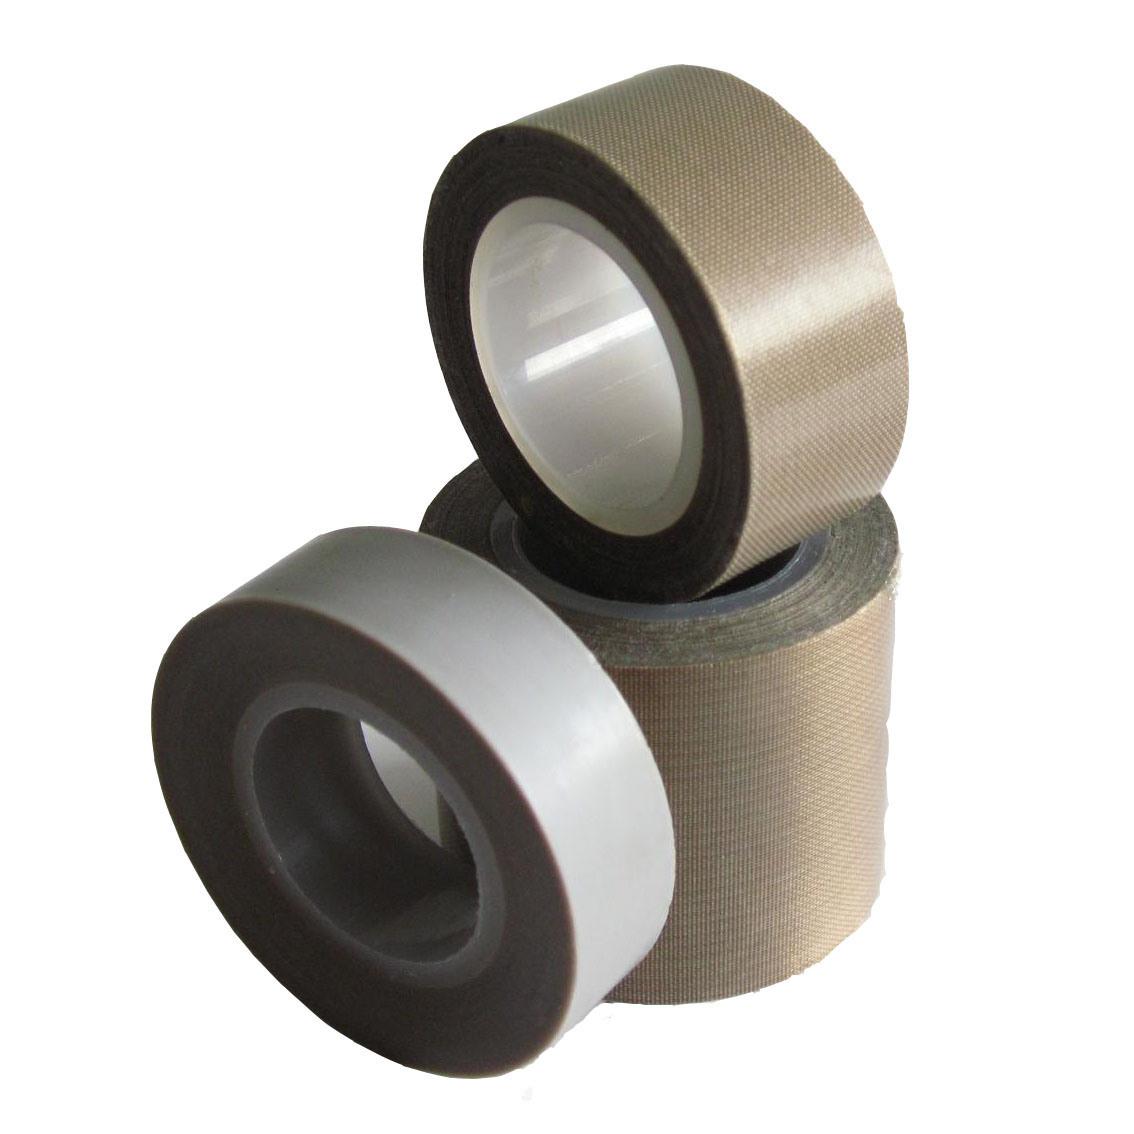 China Teflon Adhesive Tape For Electric Use China Teflon